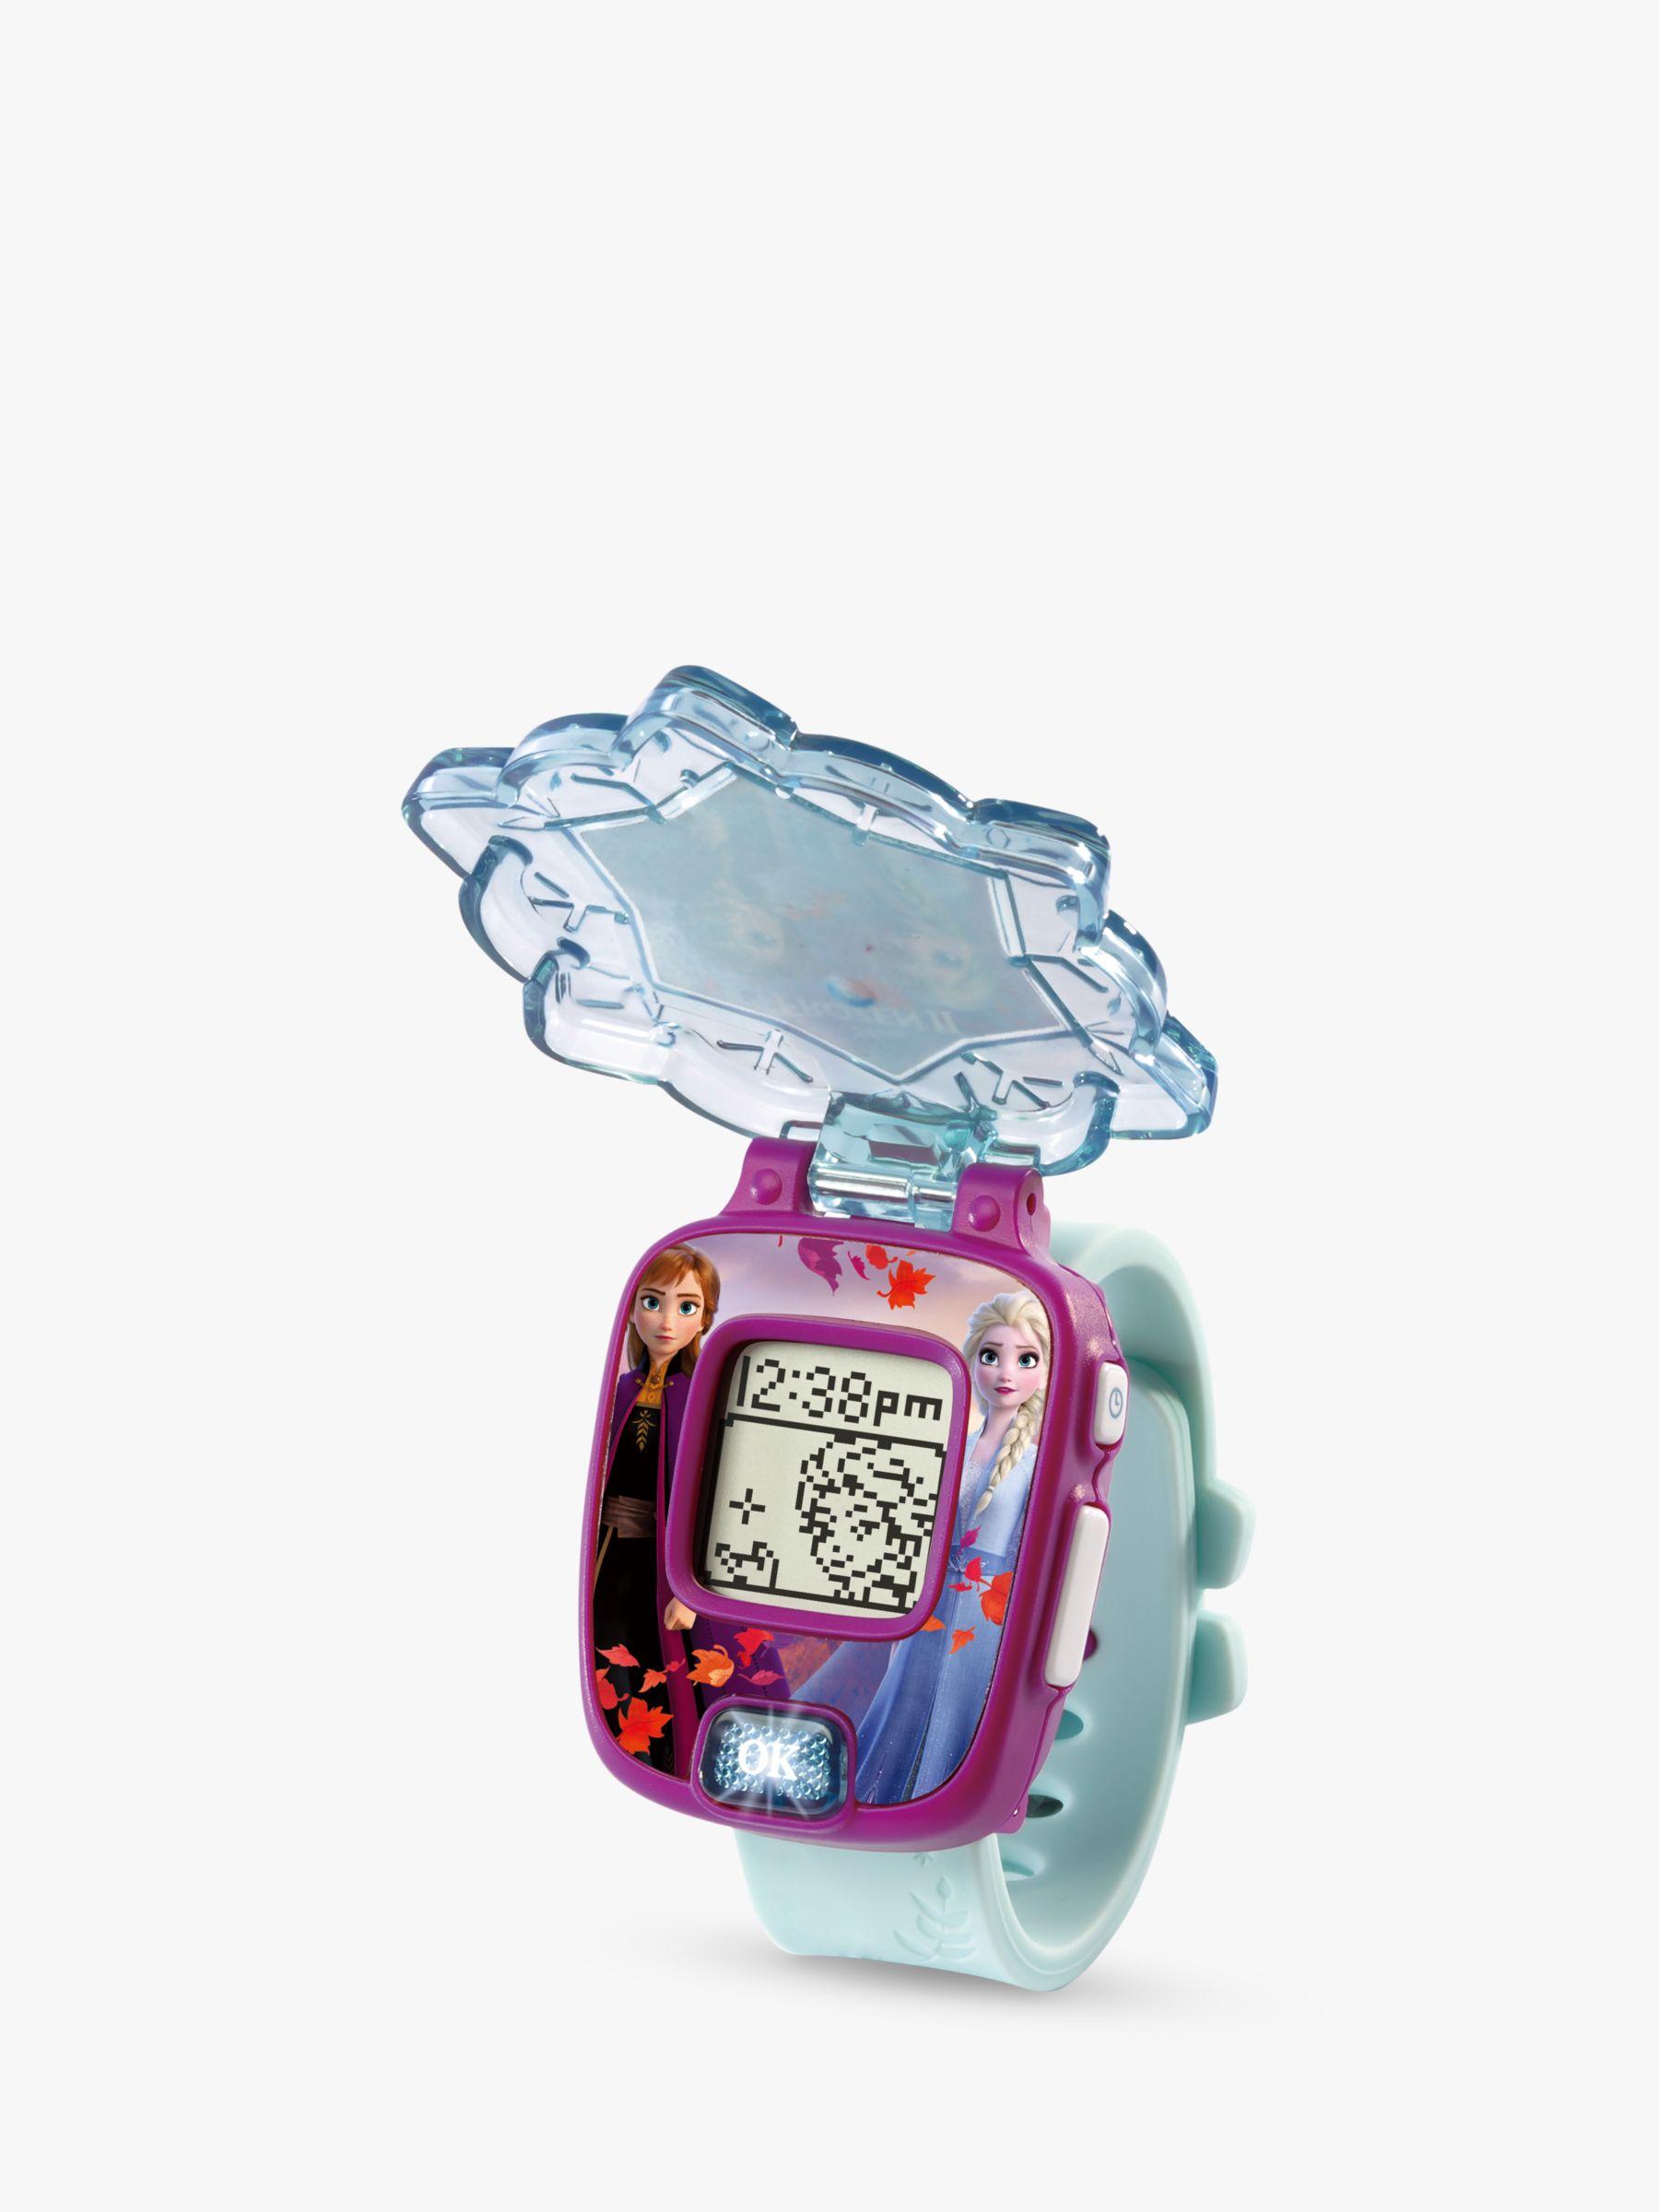 Vtech VTech Disney Frozen II Magic Learning Watch